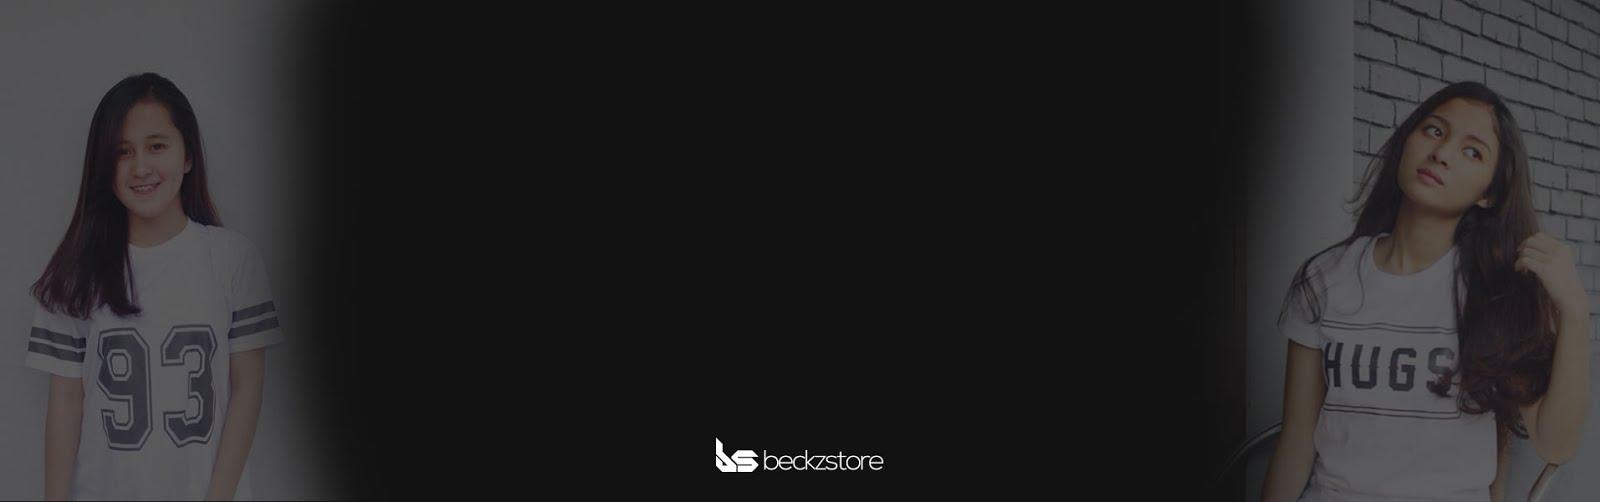 Wellcome to Beckzstore